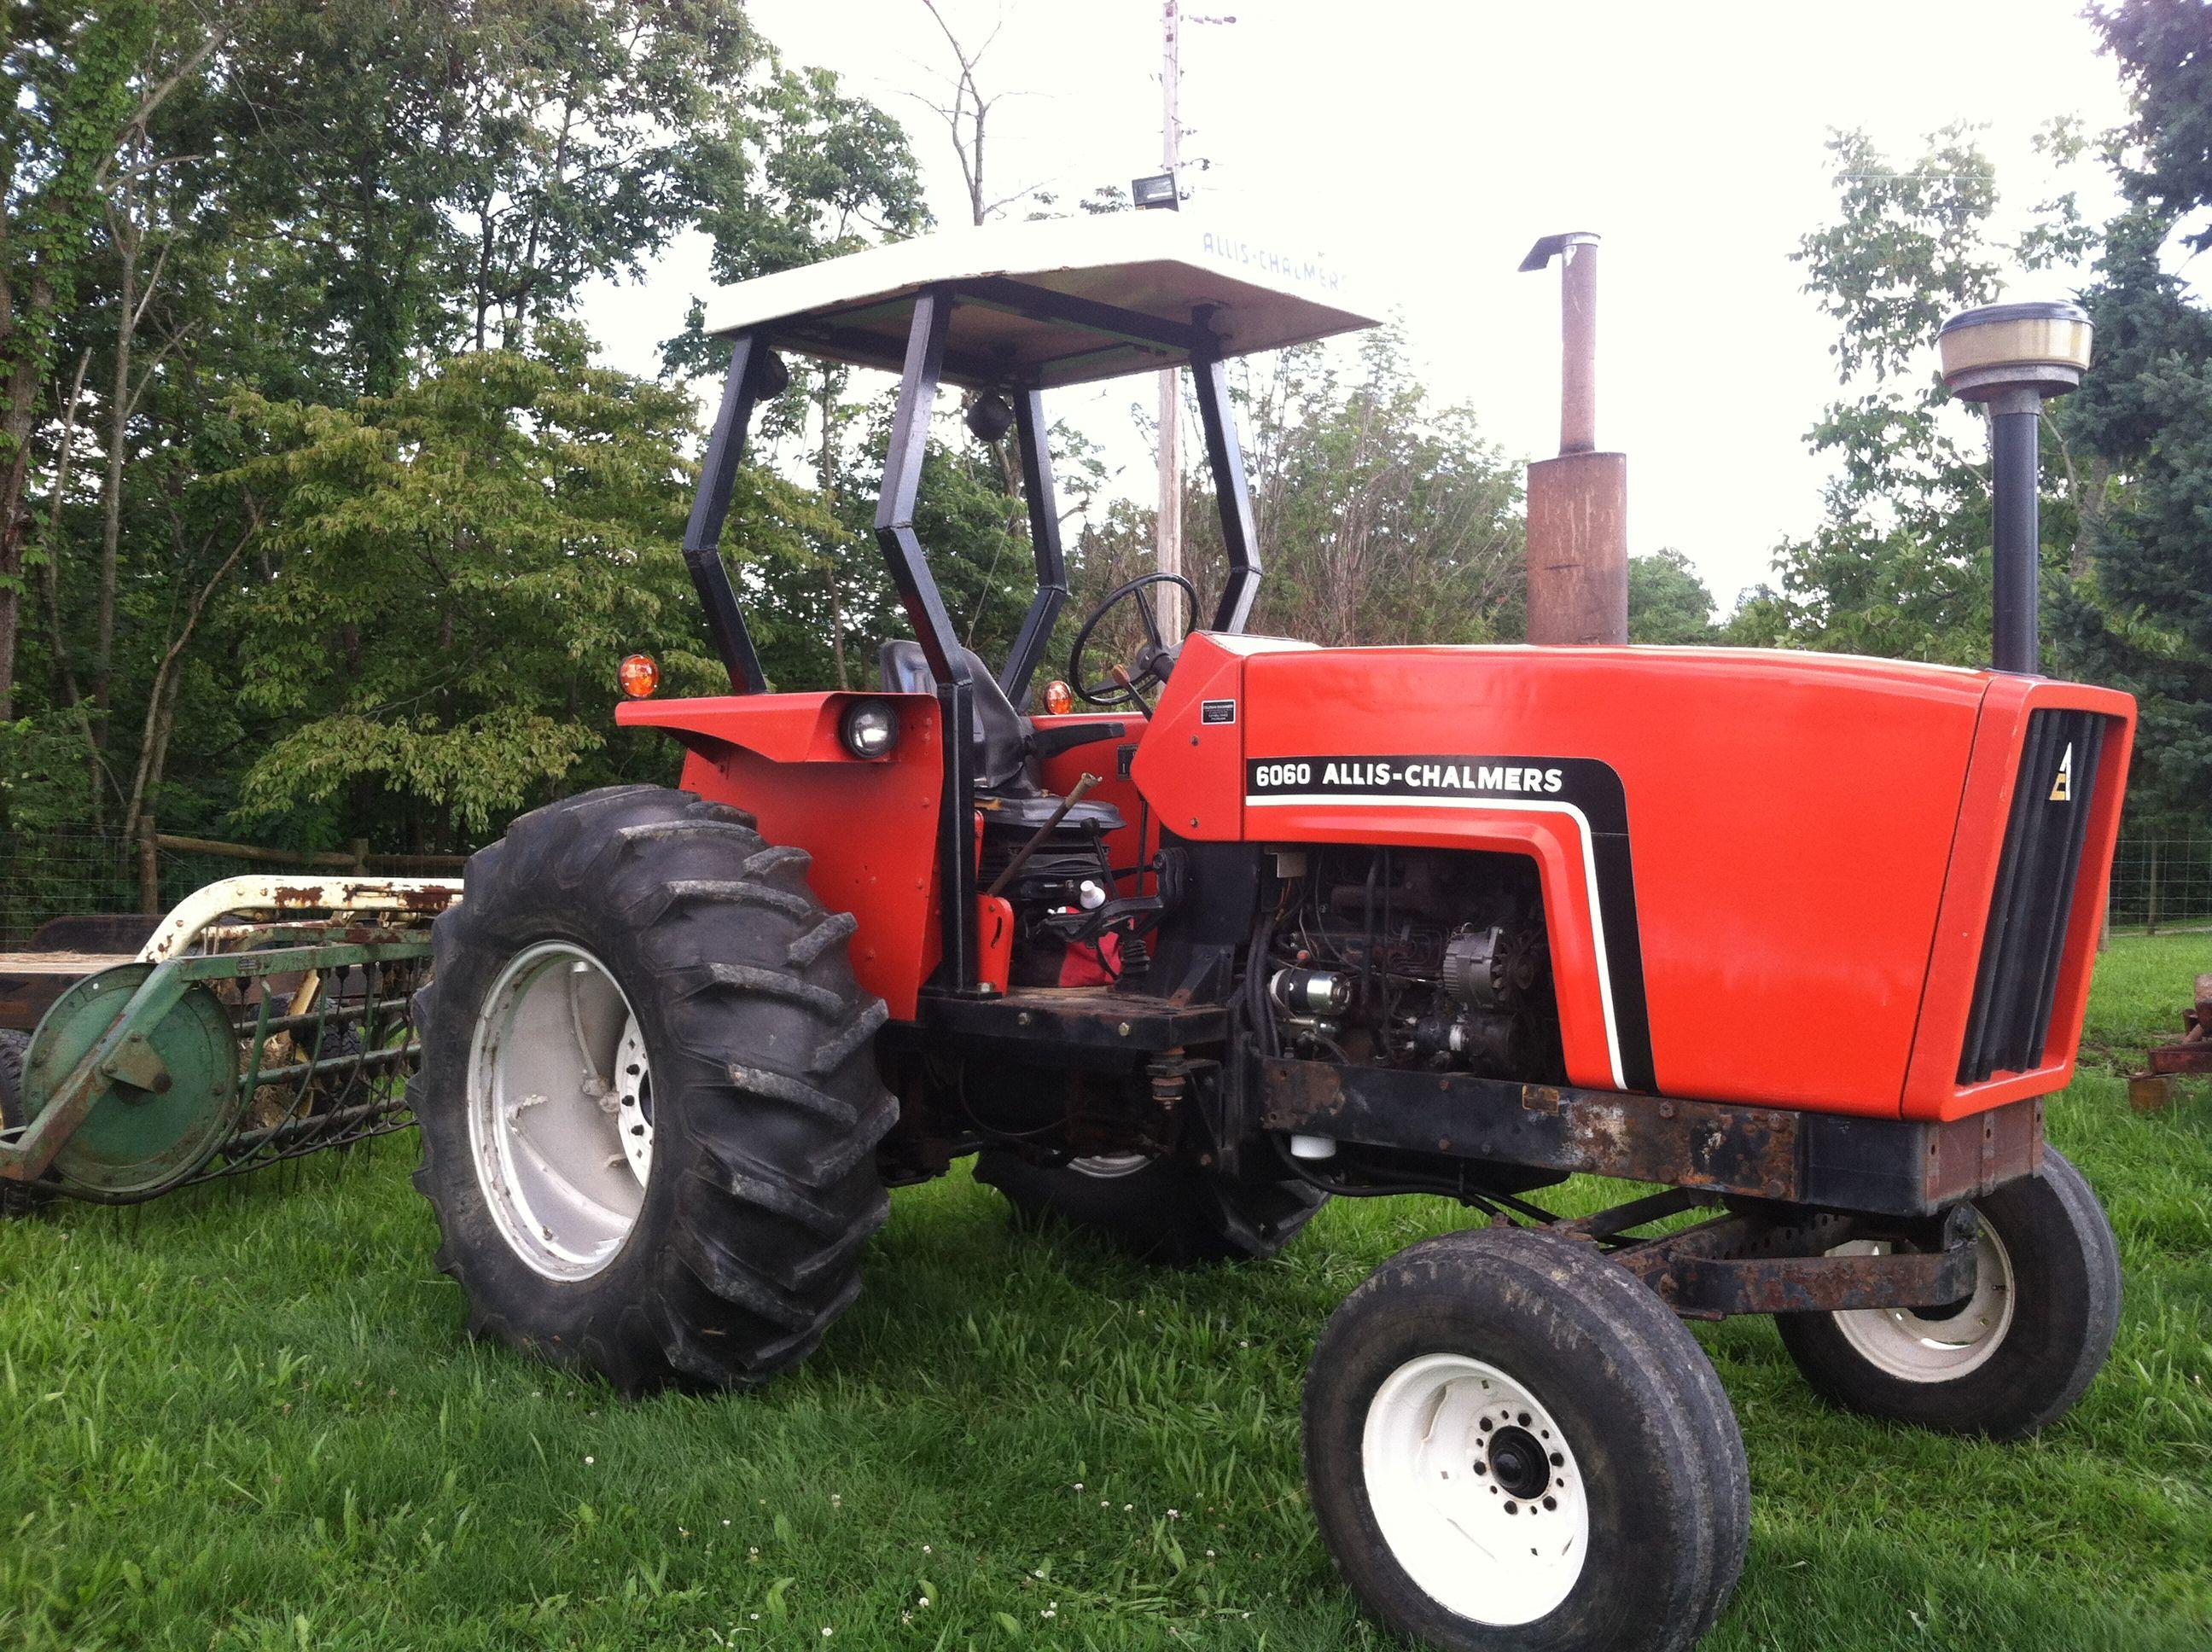 Allis Chalmers 6060 John Deere hay rake | Farm life ...